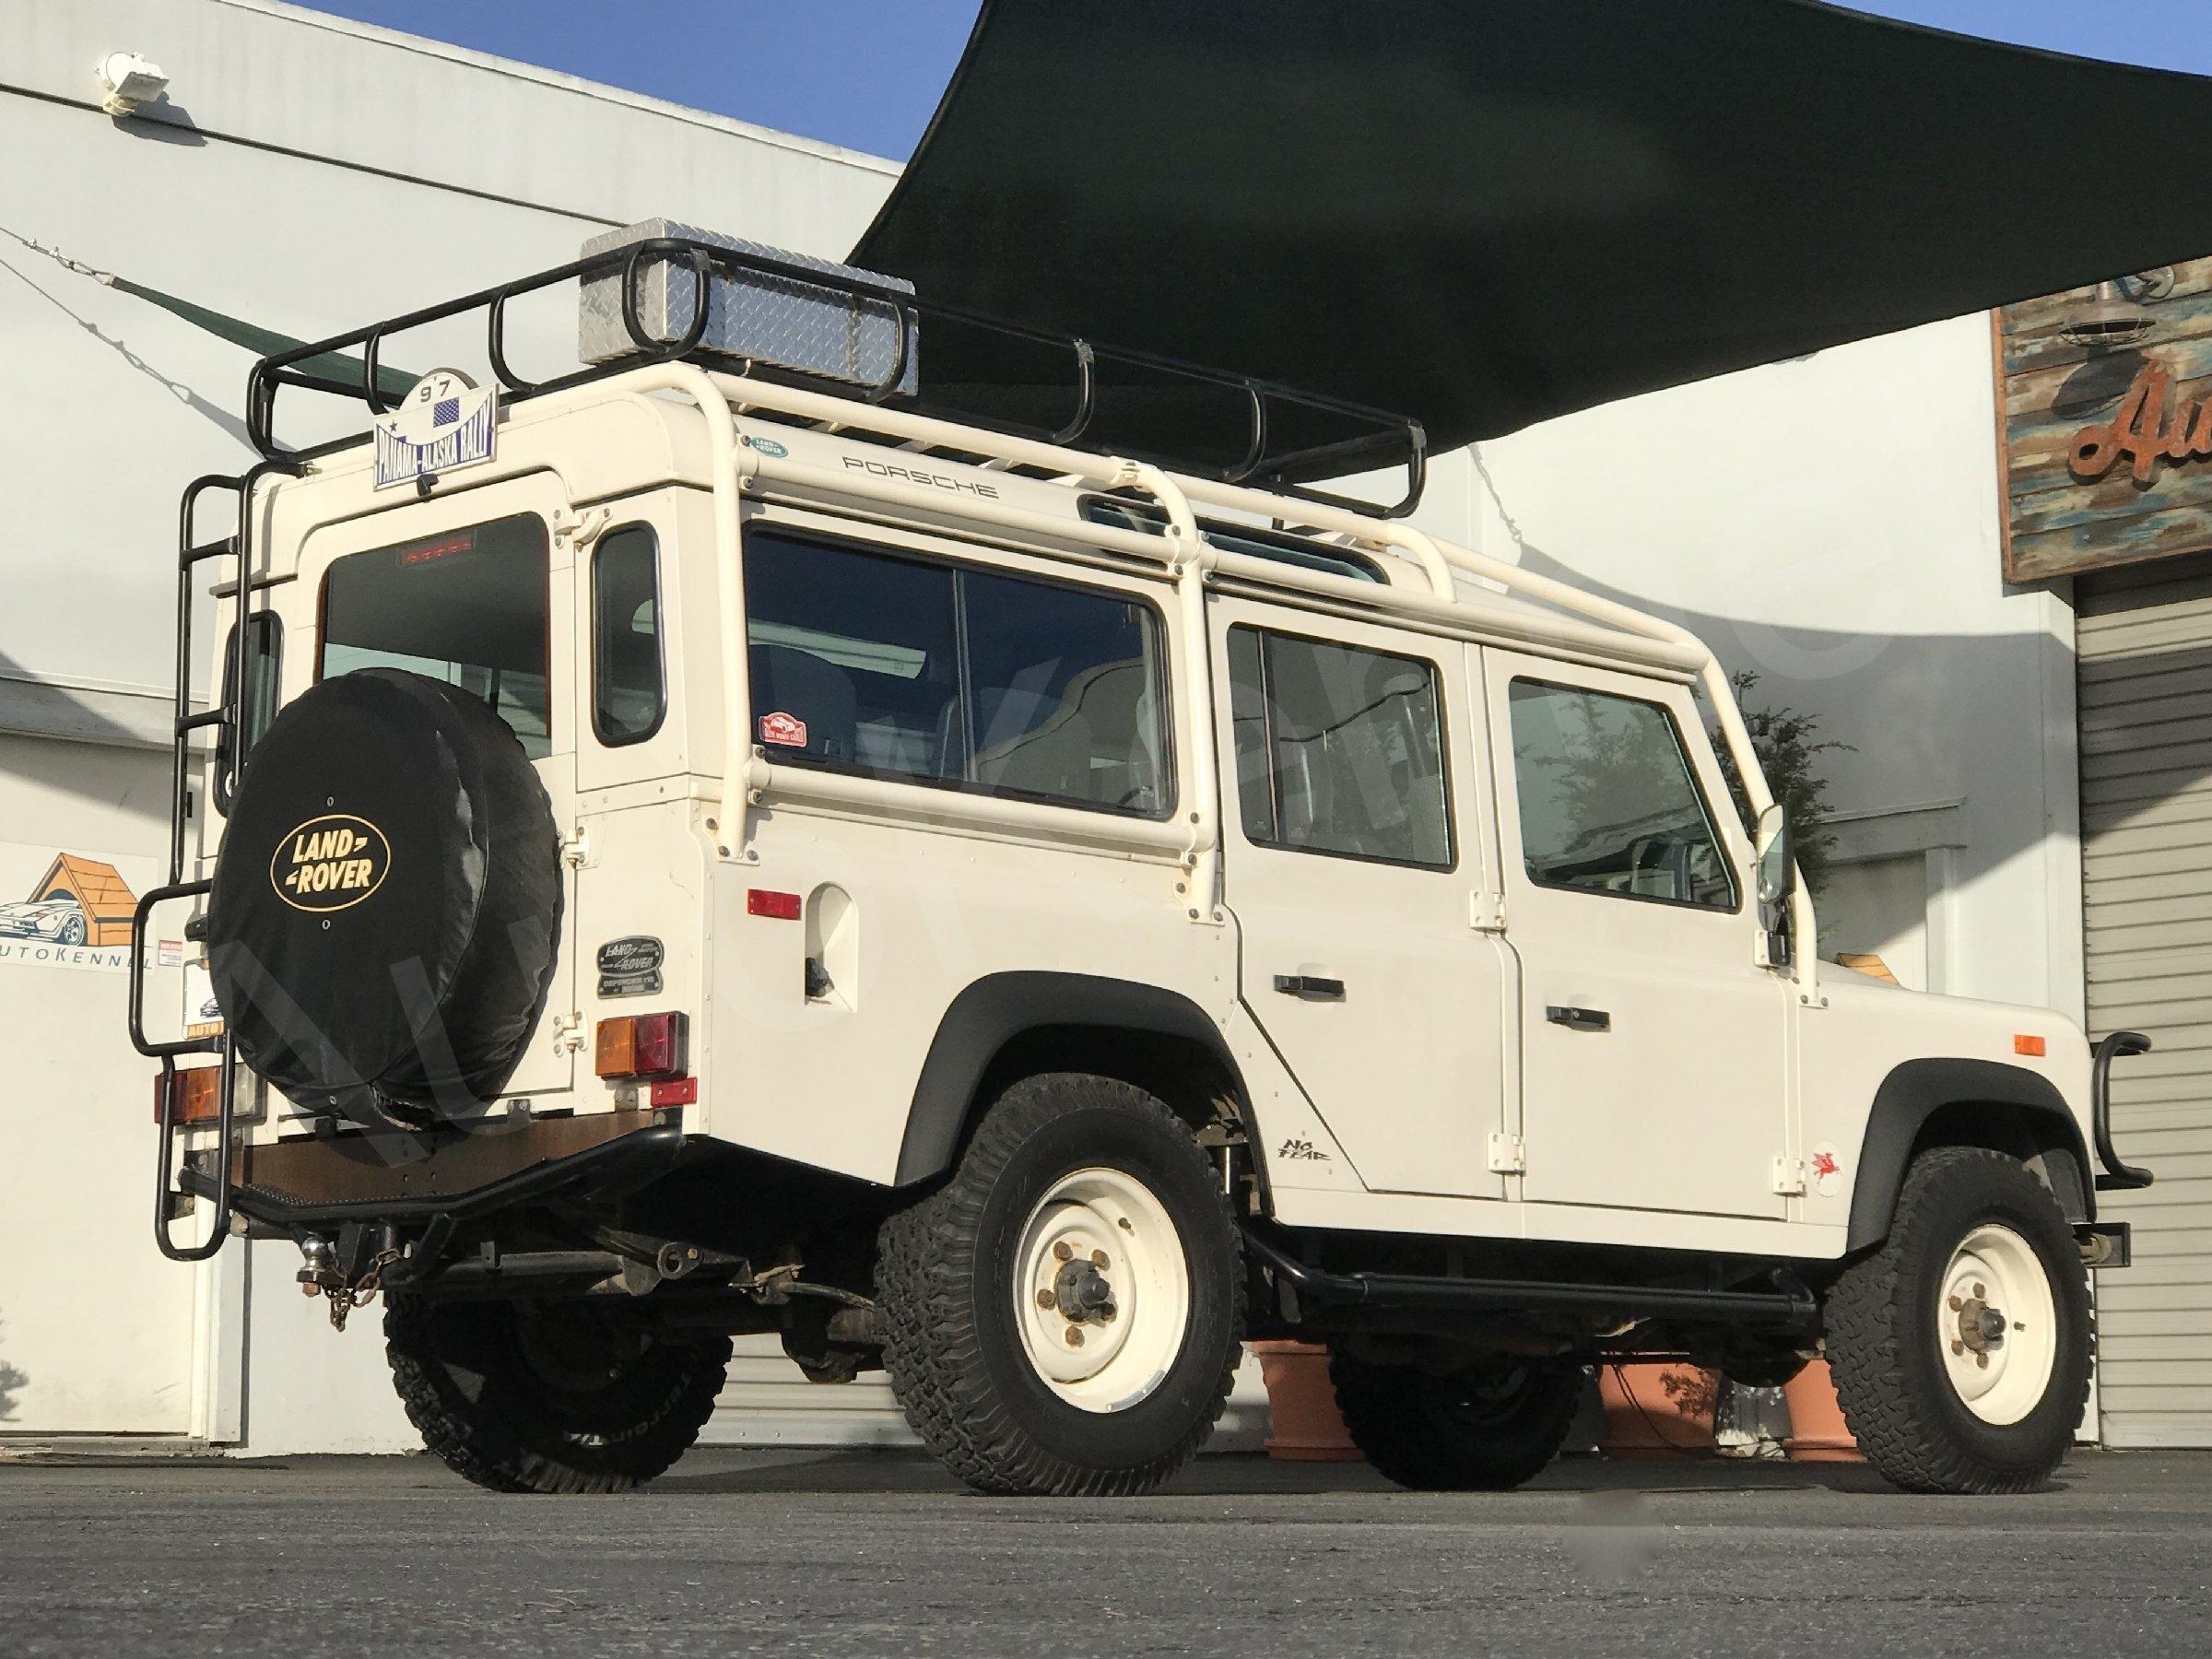 throtl 1993 Land Rover Defender NAS 110 1 of 500 1 Owner Jeff